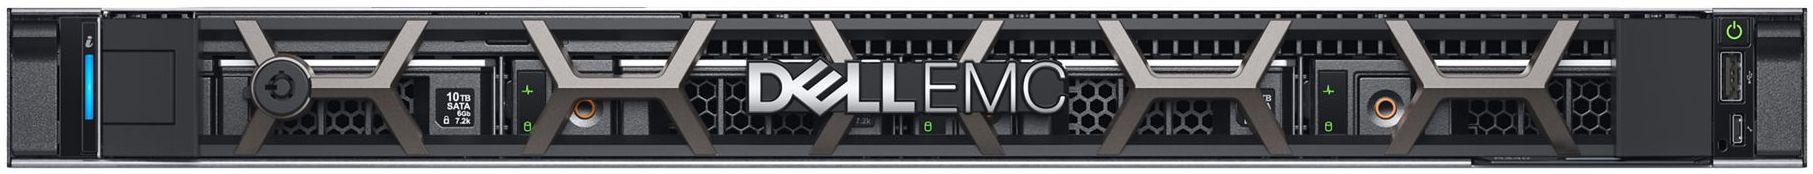 Dell EMC PowerEdge R340 Front